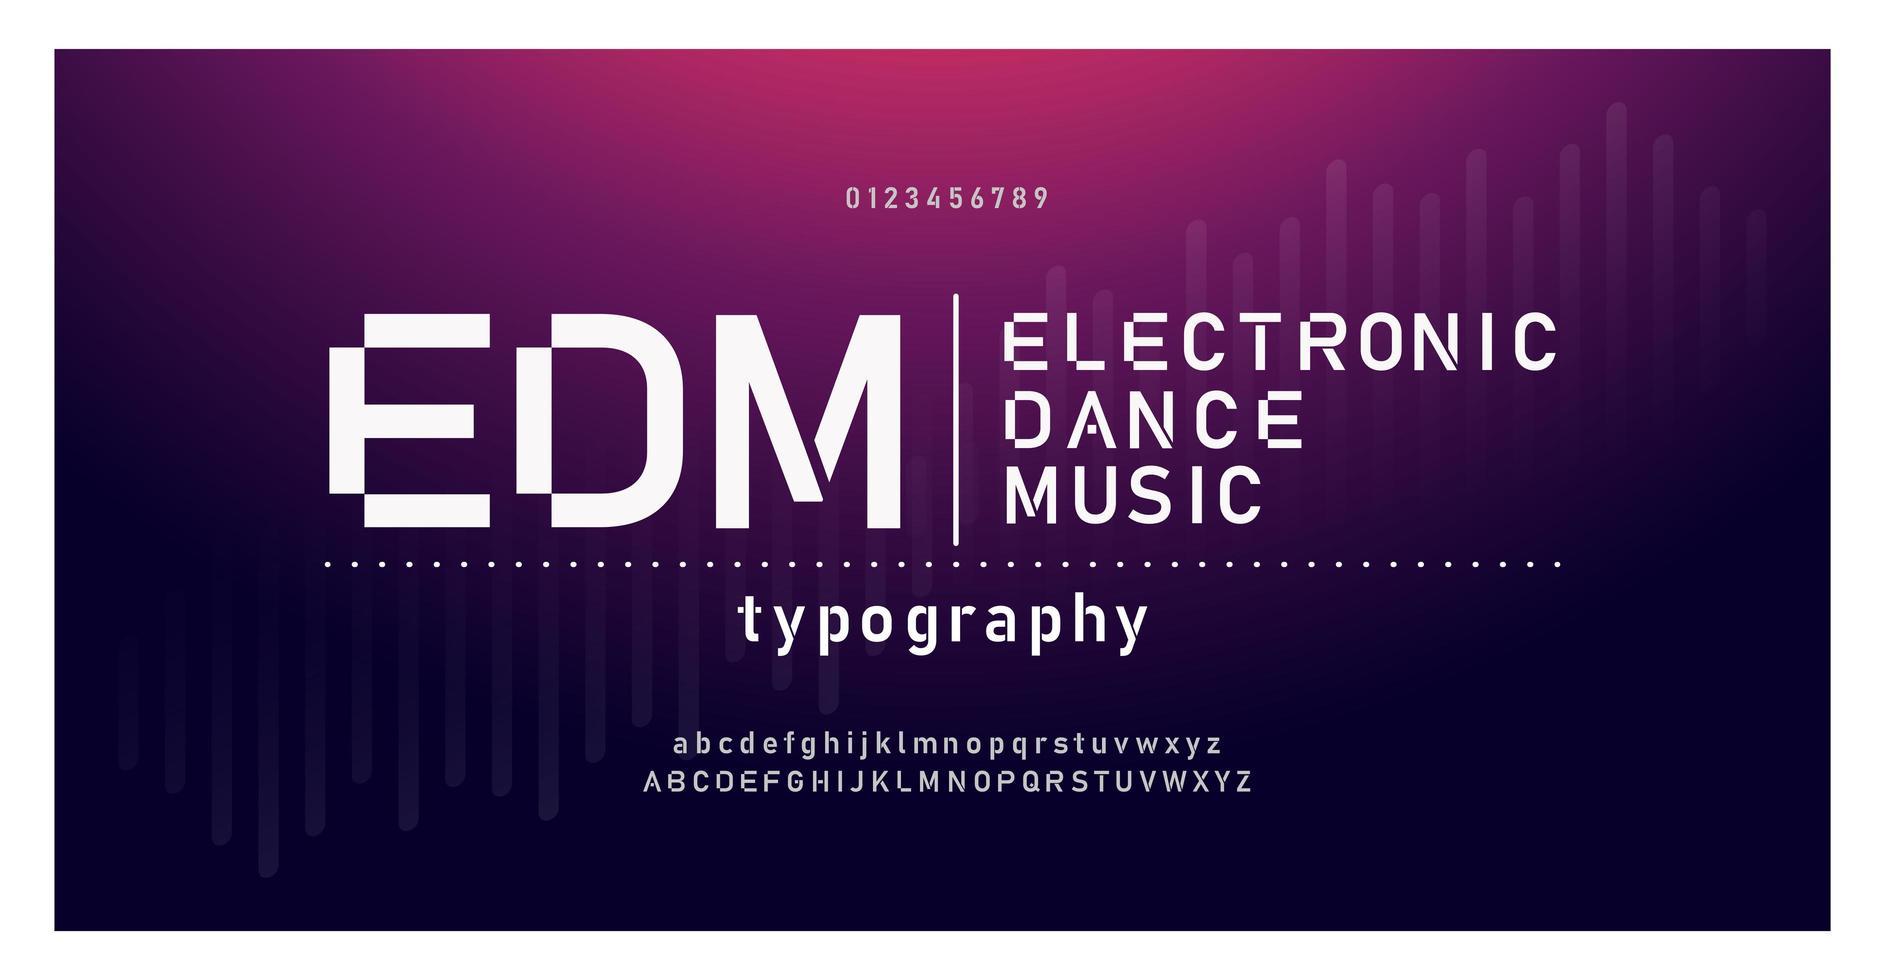 elektronische Tanzmusik Zukunft kreative Schrift vektor